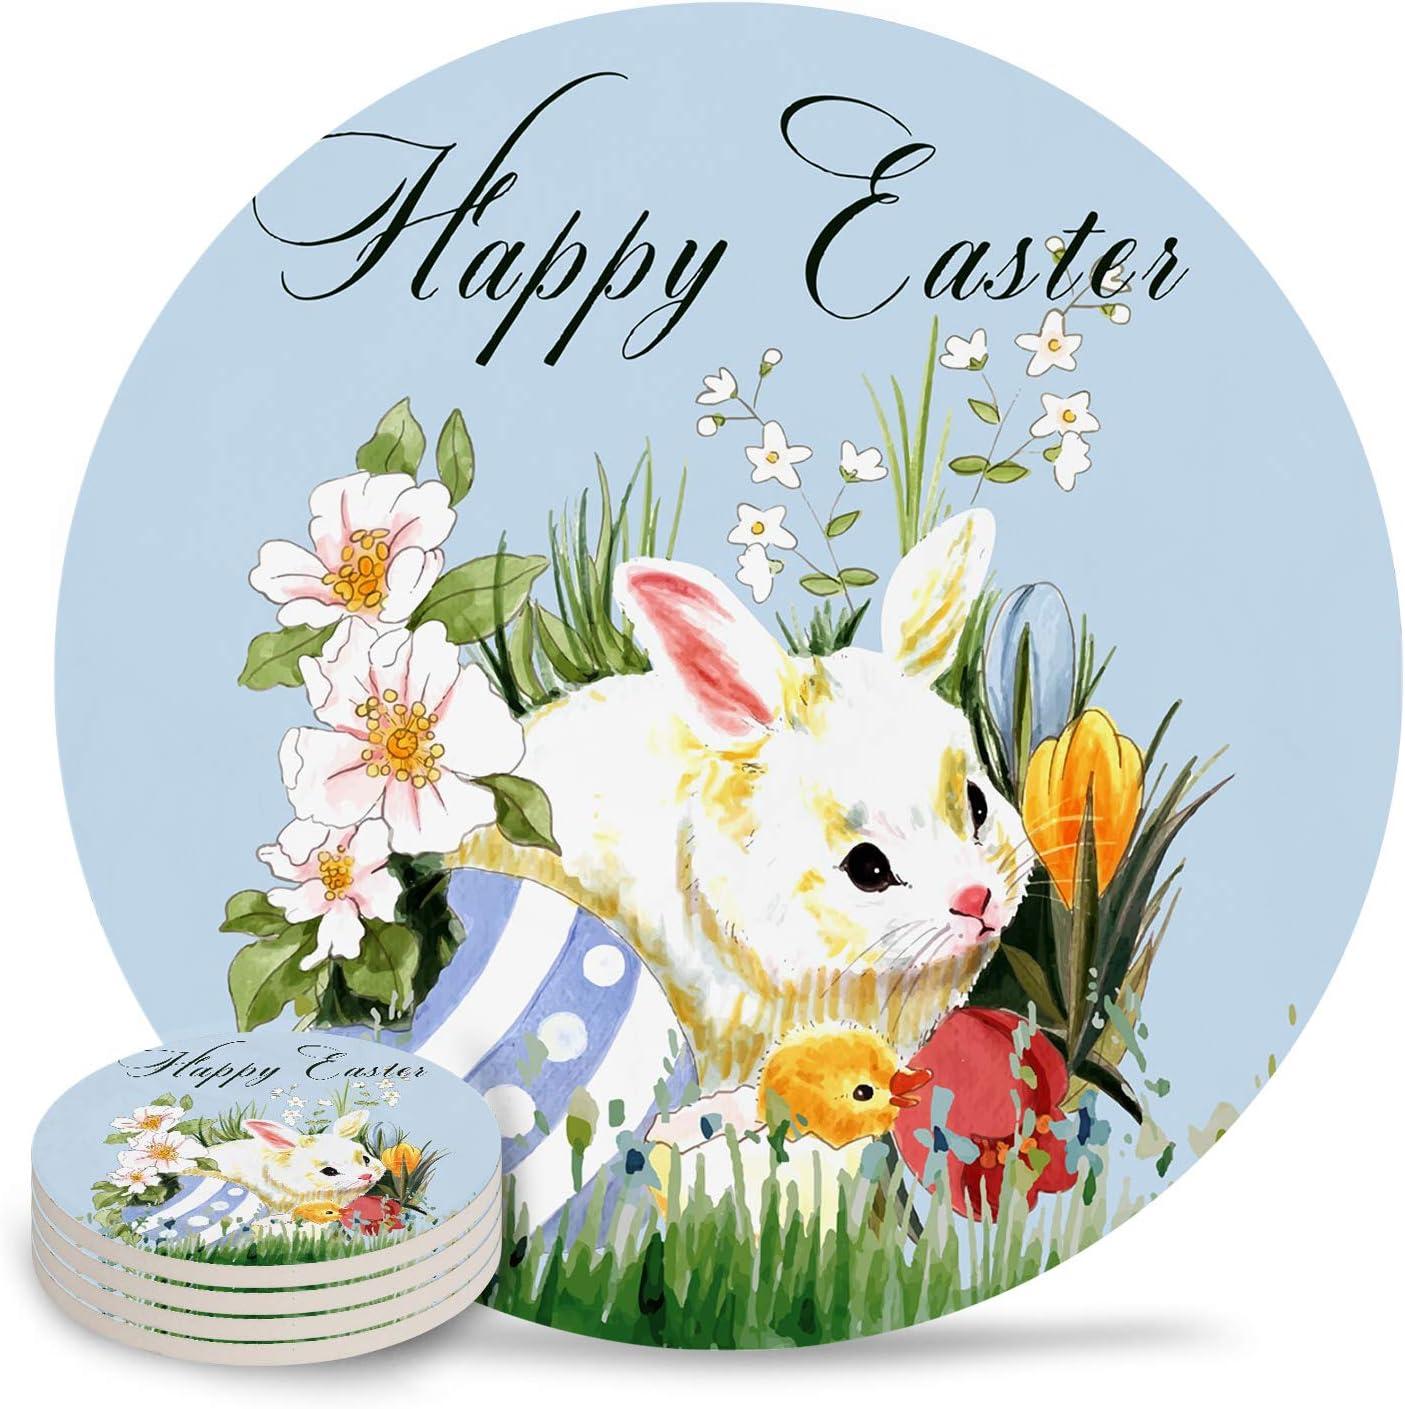 Drink Coasters Happy Easter Max 70% OFF Floral Absorbe Watercolor Bunny Colorado Springs Mall Eggs